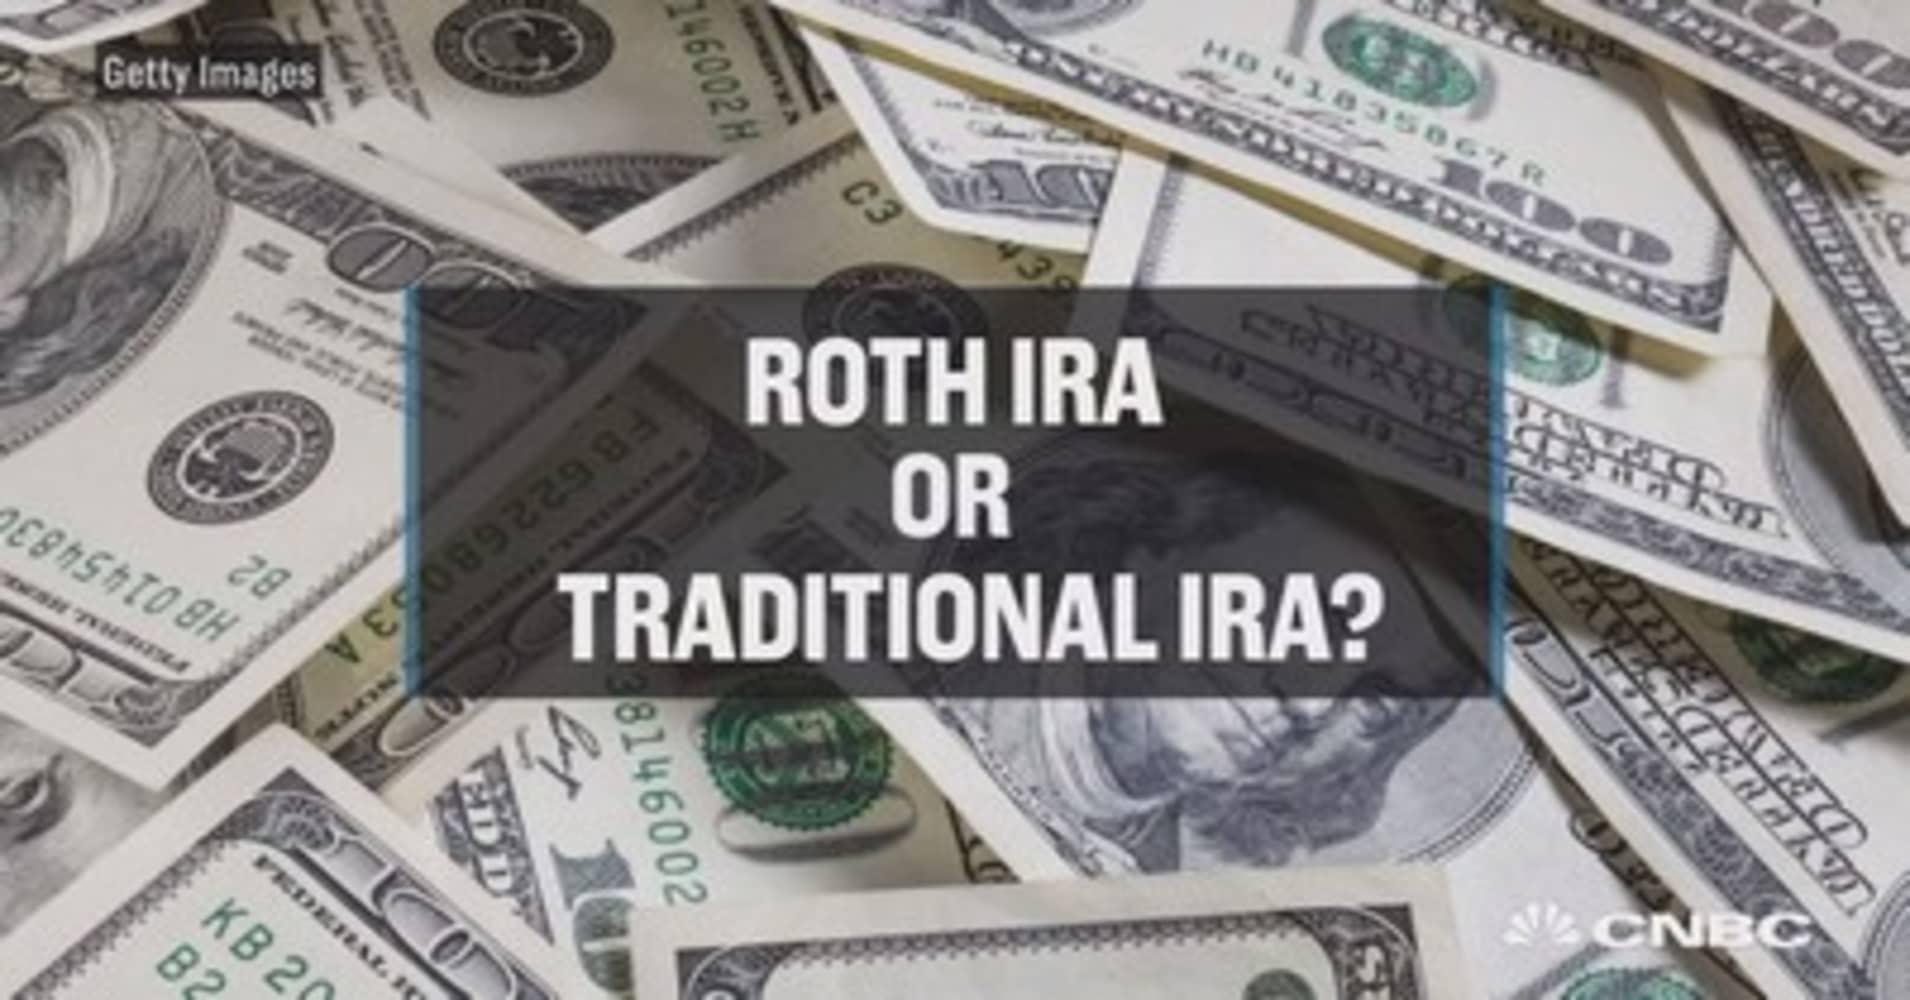 traditional ira versus roth ira